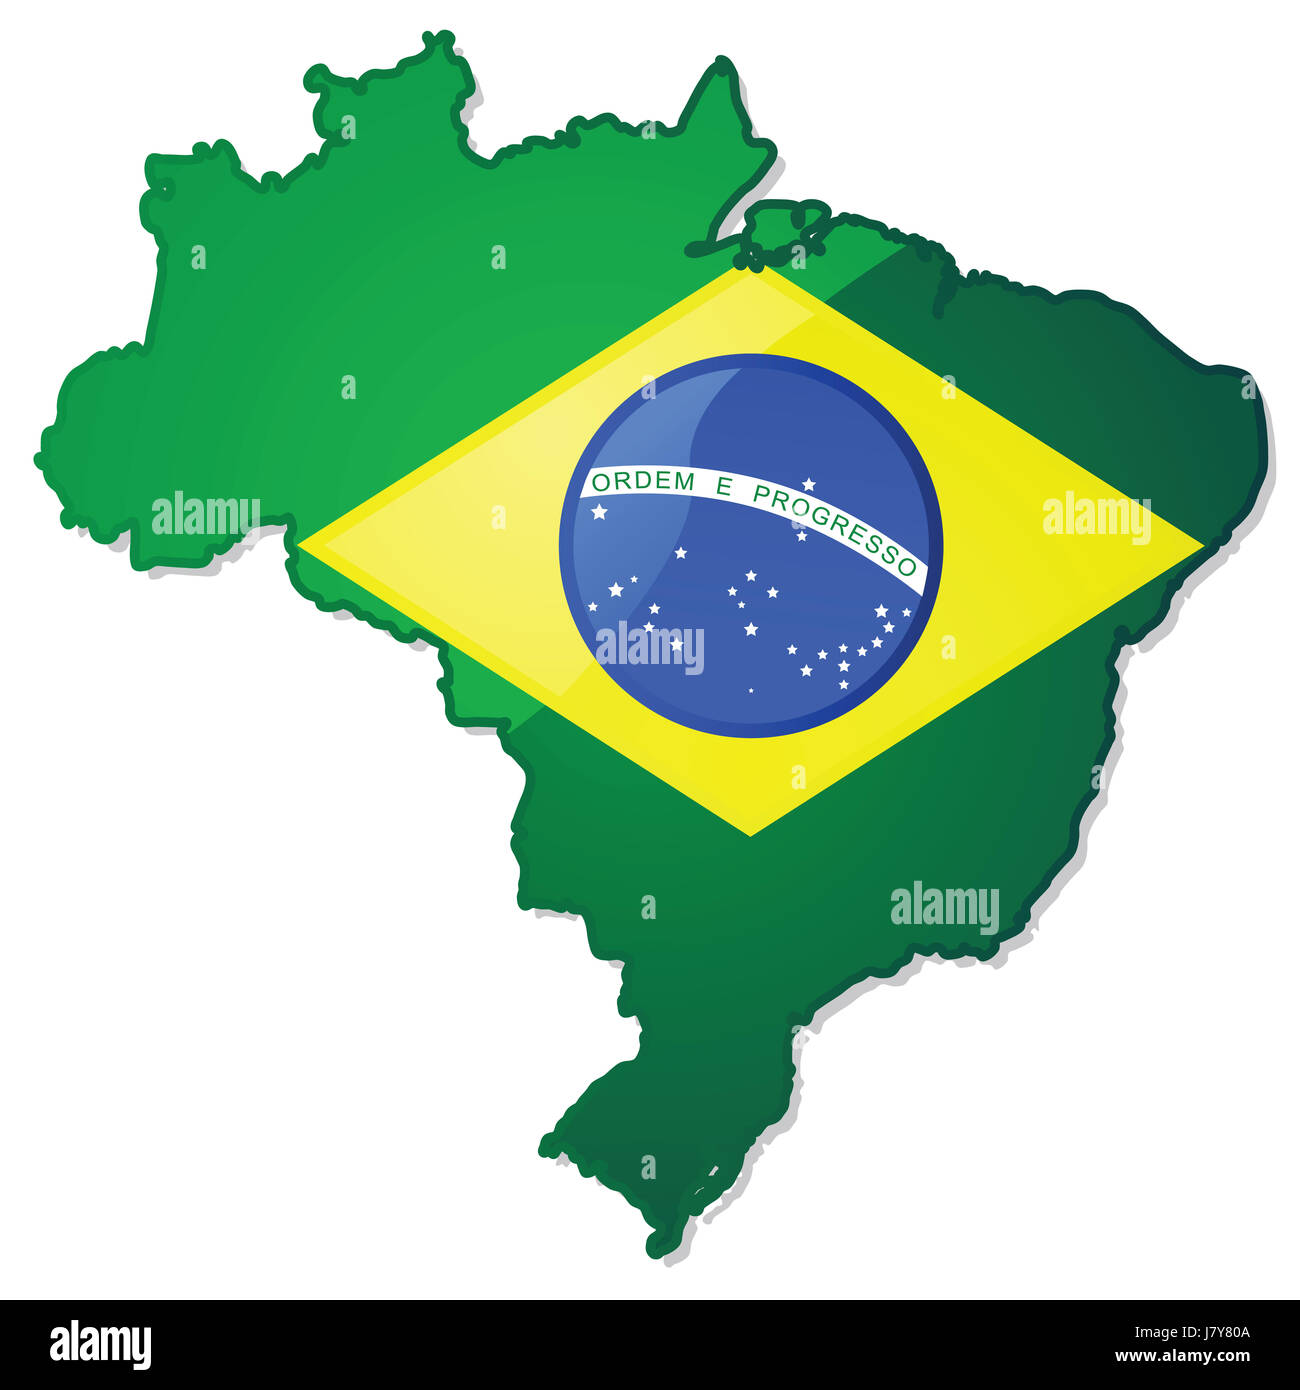 Brasilien Karte Welt.Flagge Brasilien Süd Amerika Latein Karte Atlas Landkarte Von Der